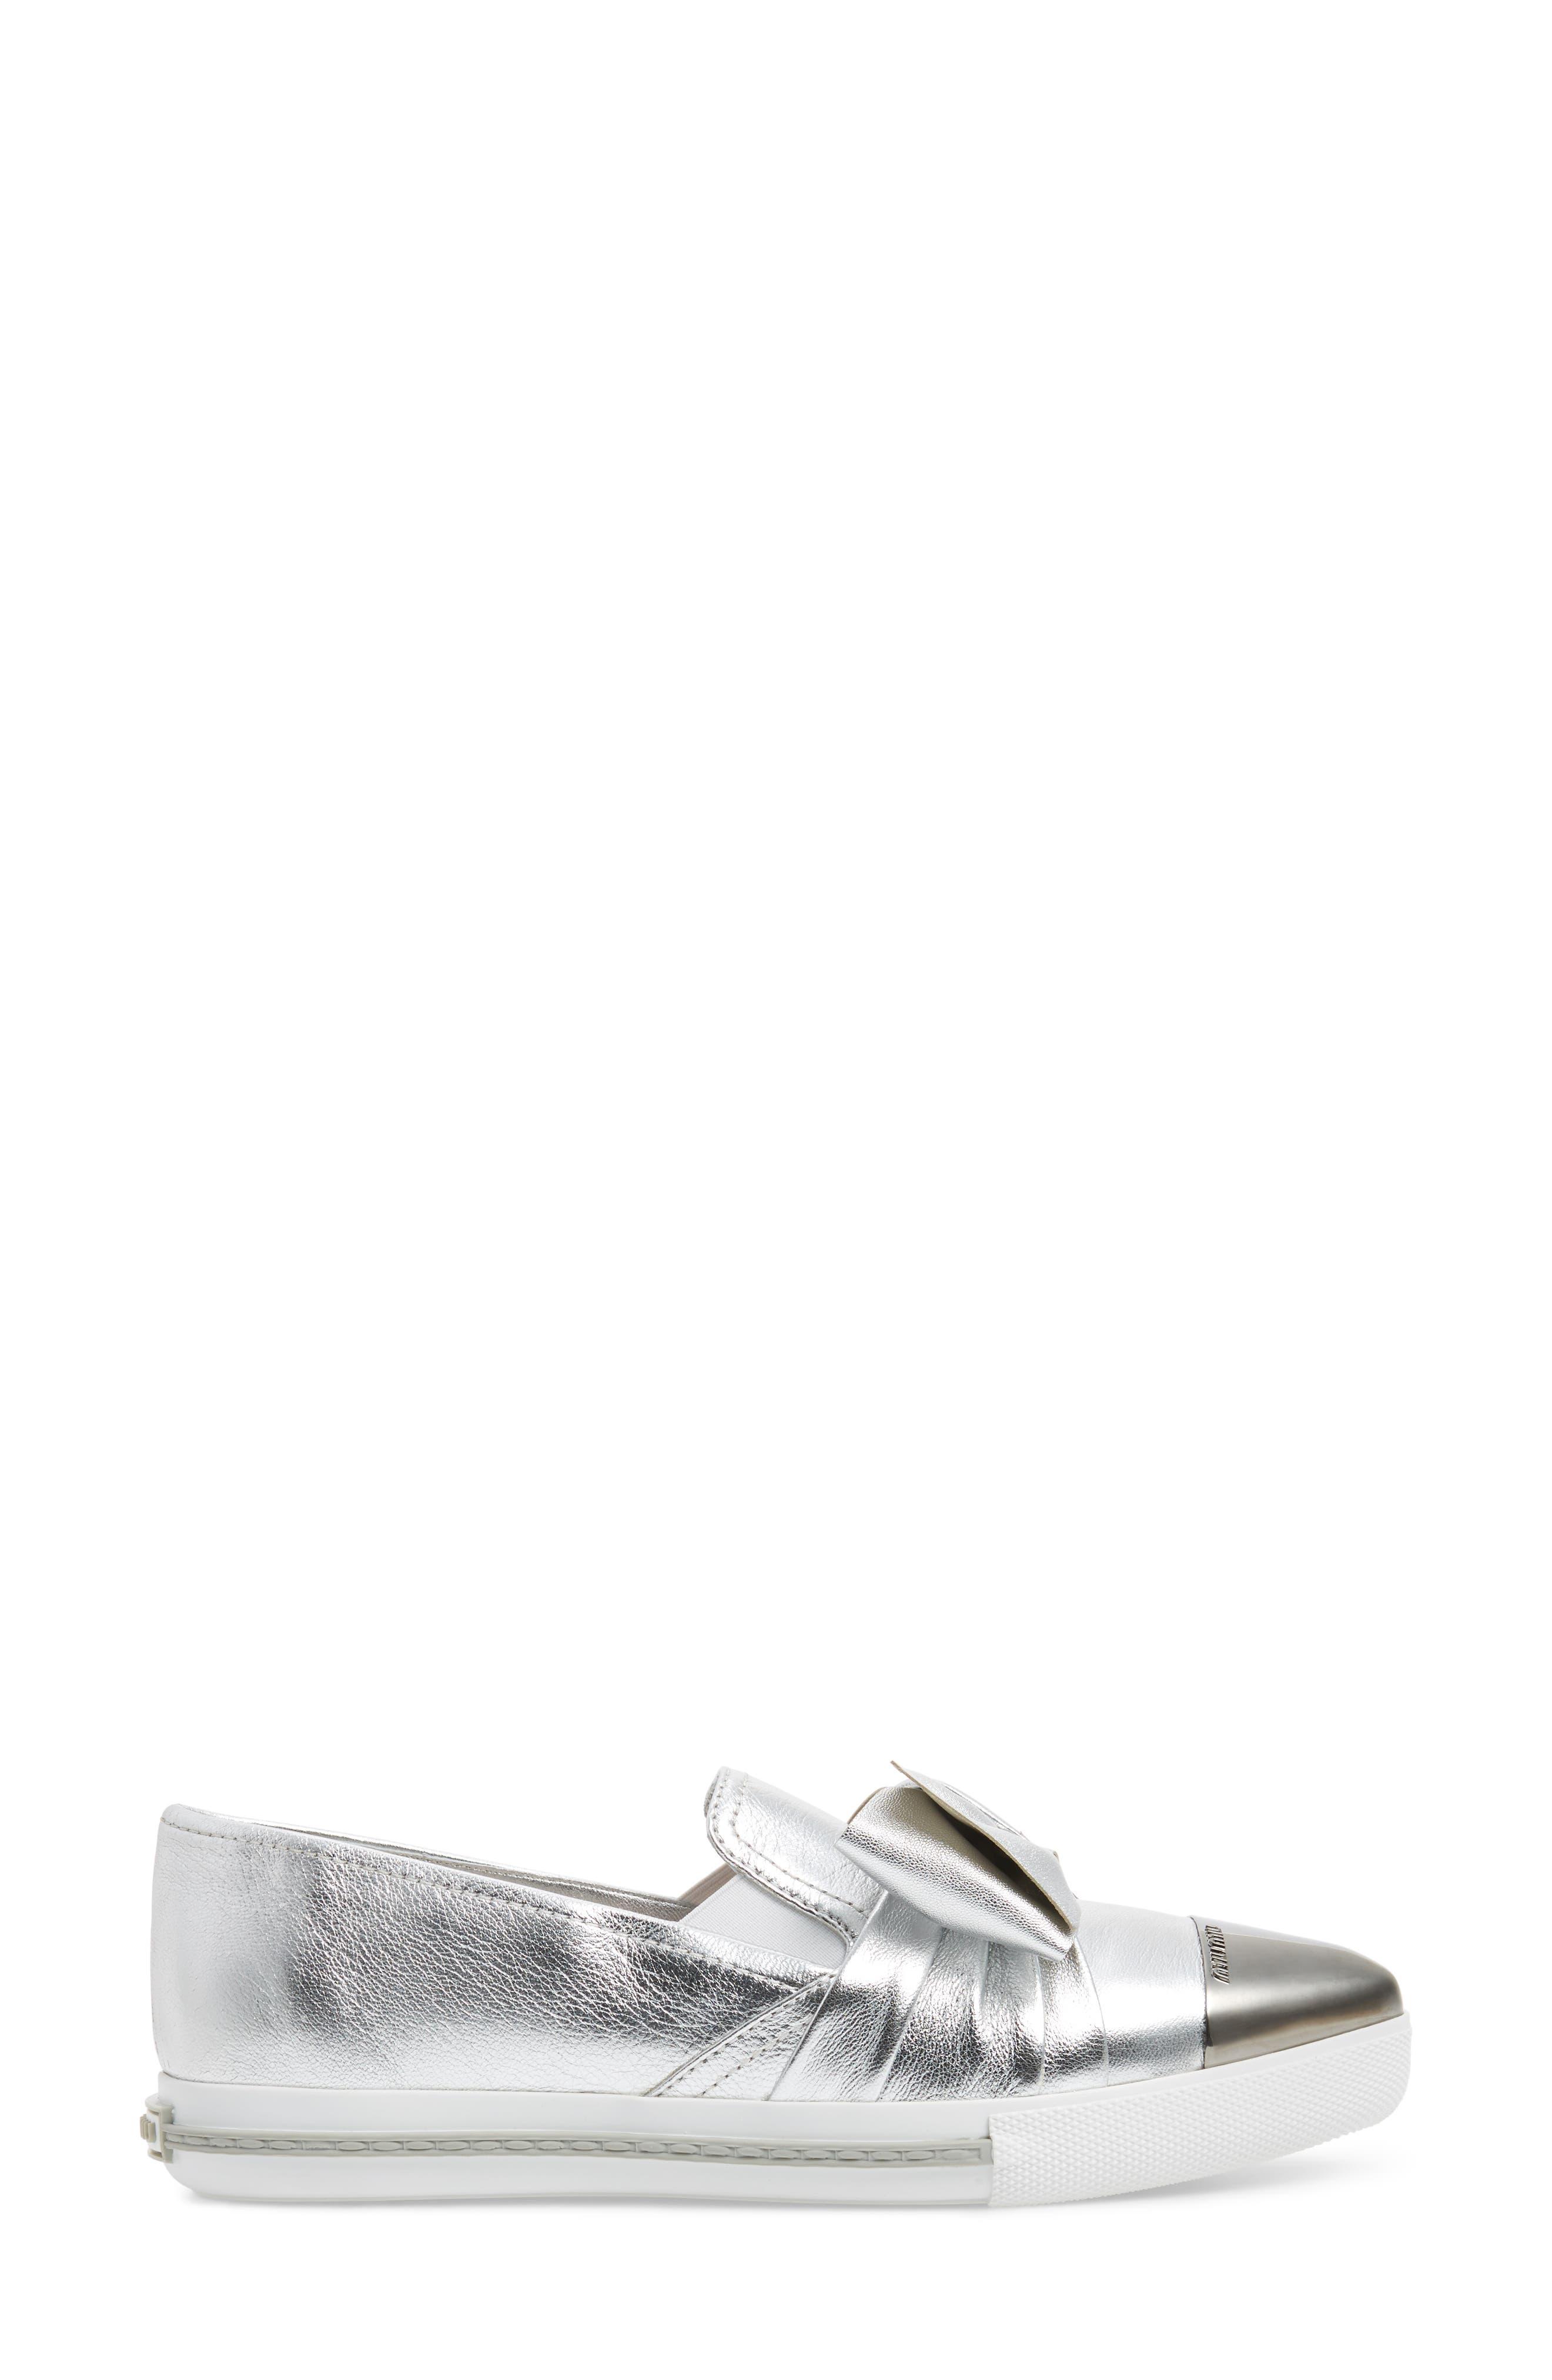 Cap Toe Hidden Wedge Sneaker,                             Alternate thumbnail 3, color,                             Silver